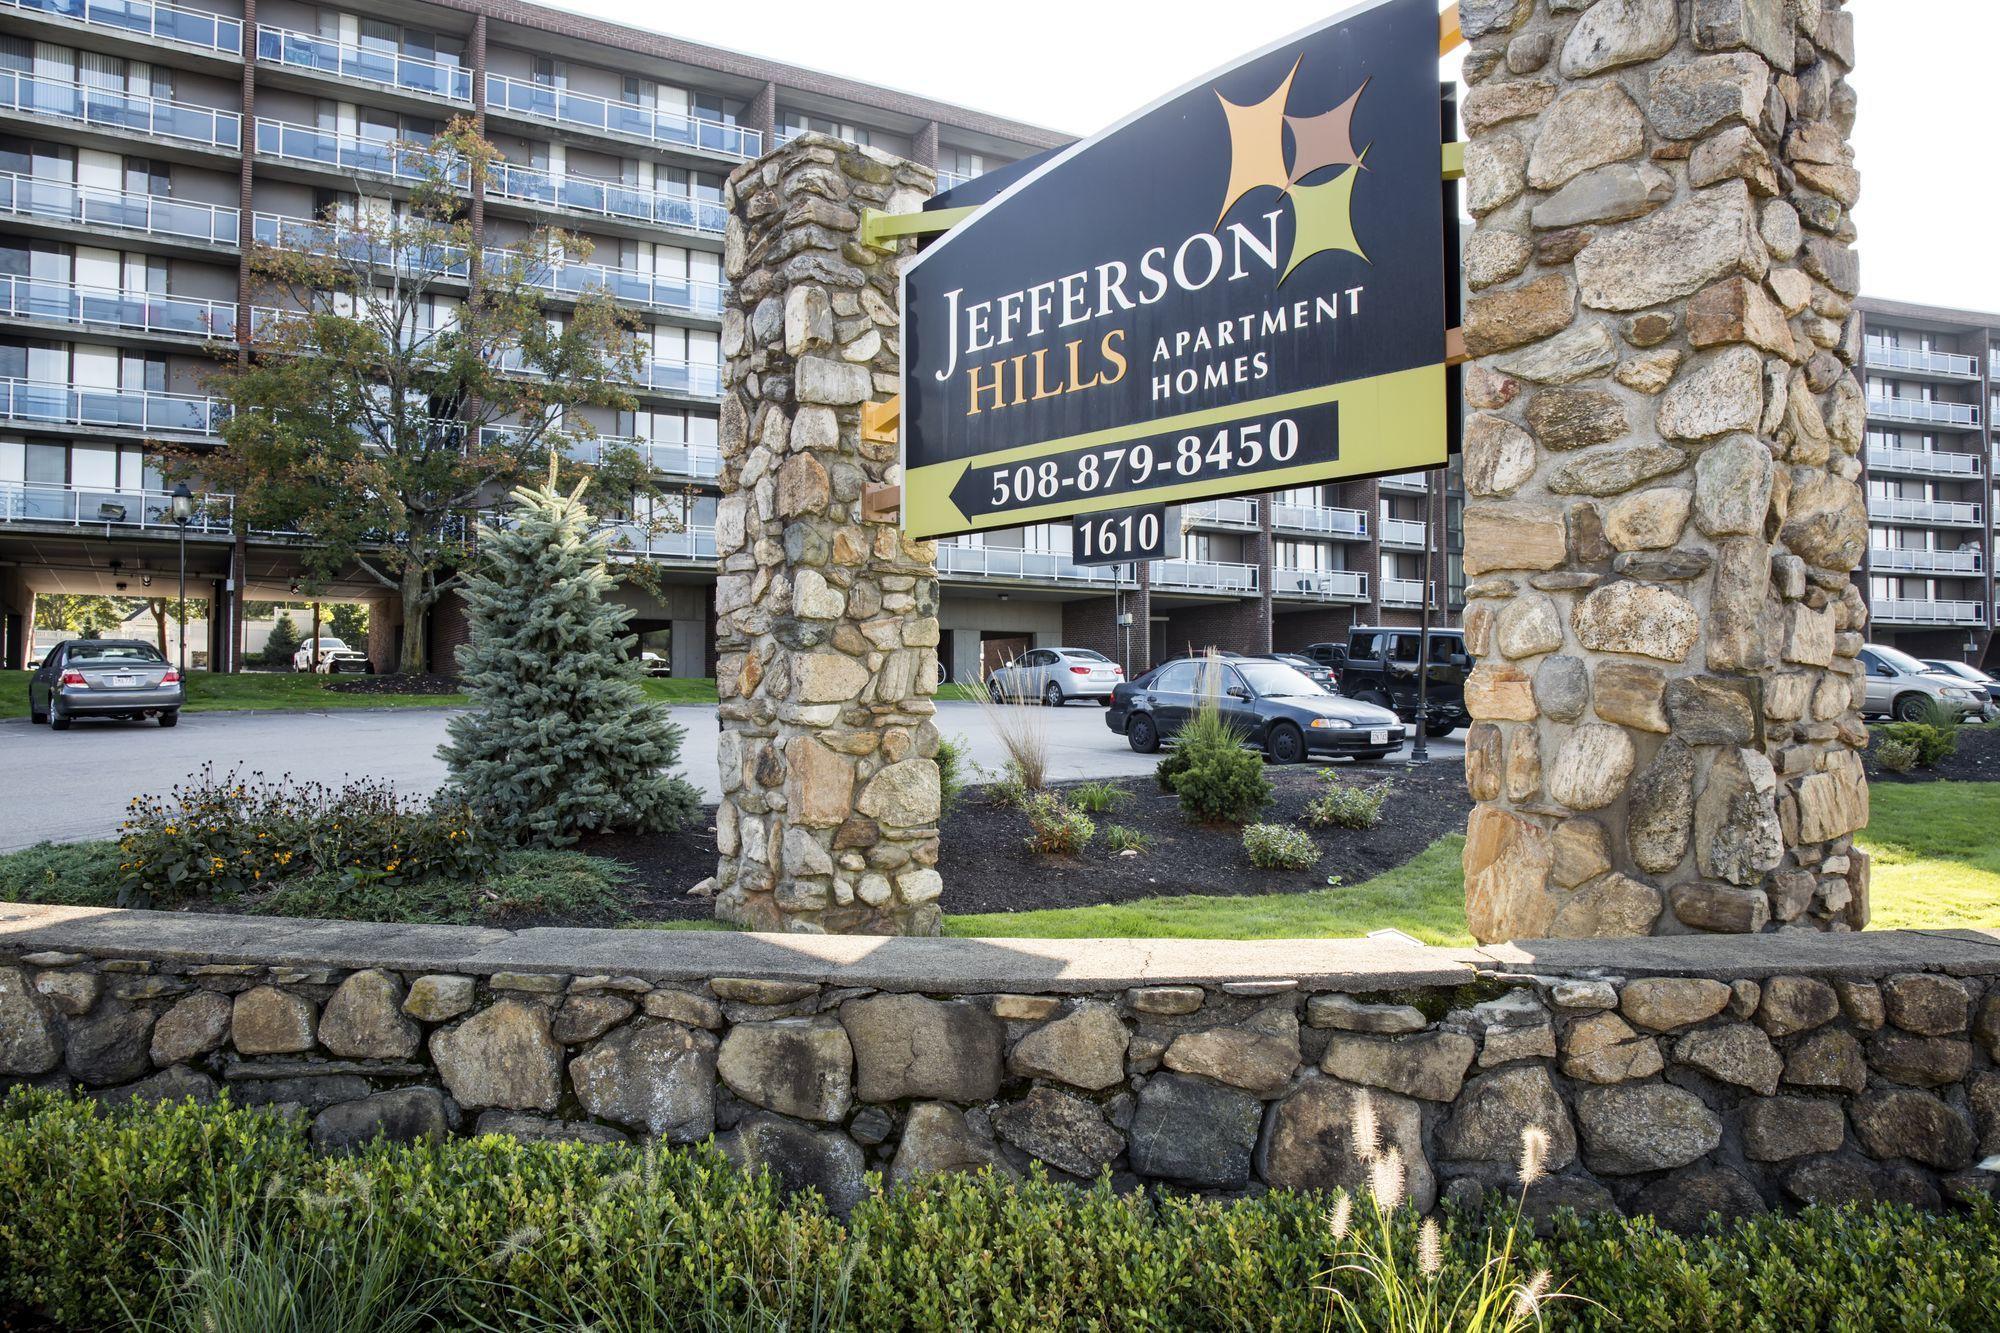 Jefferson Hills